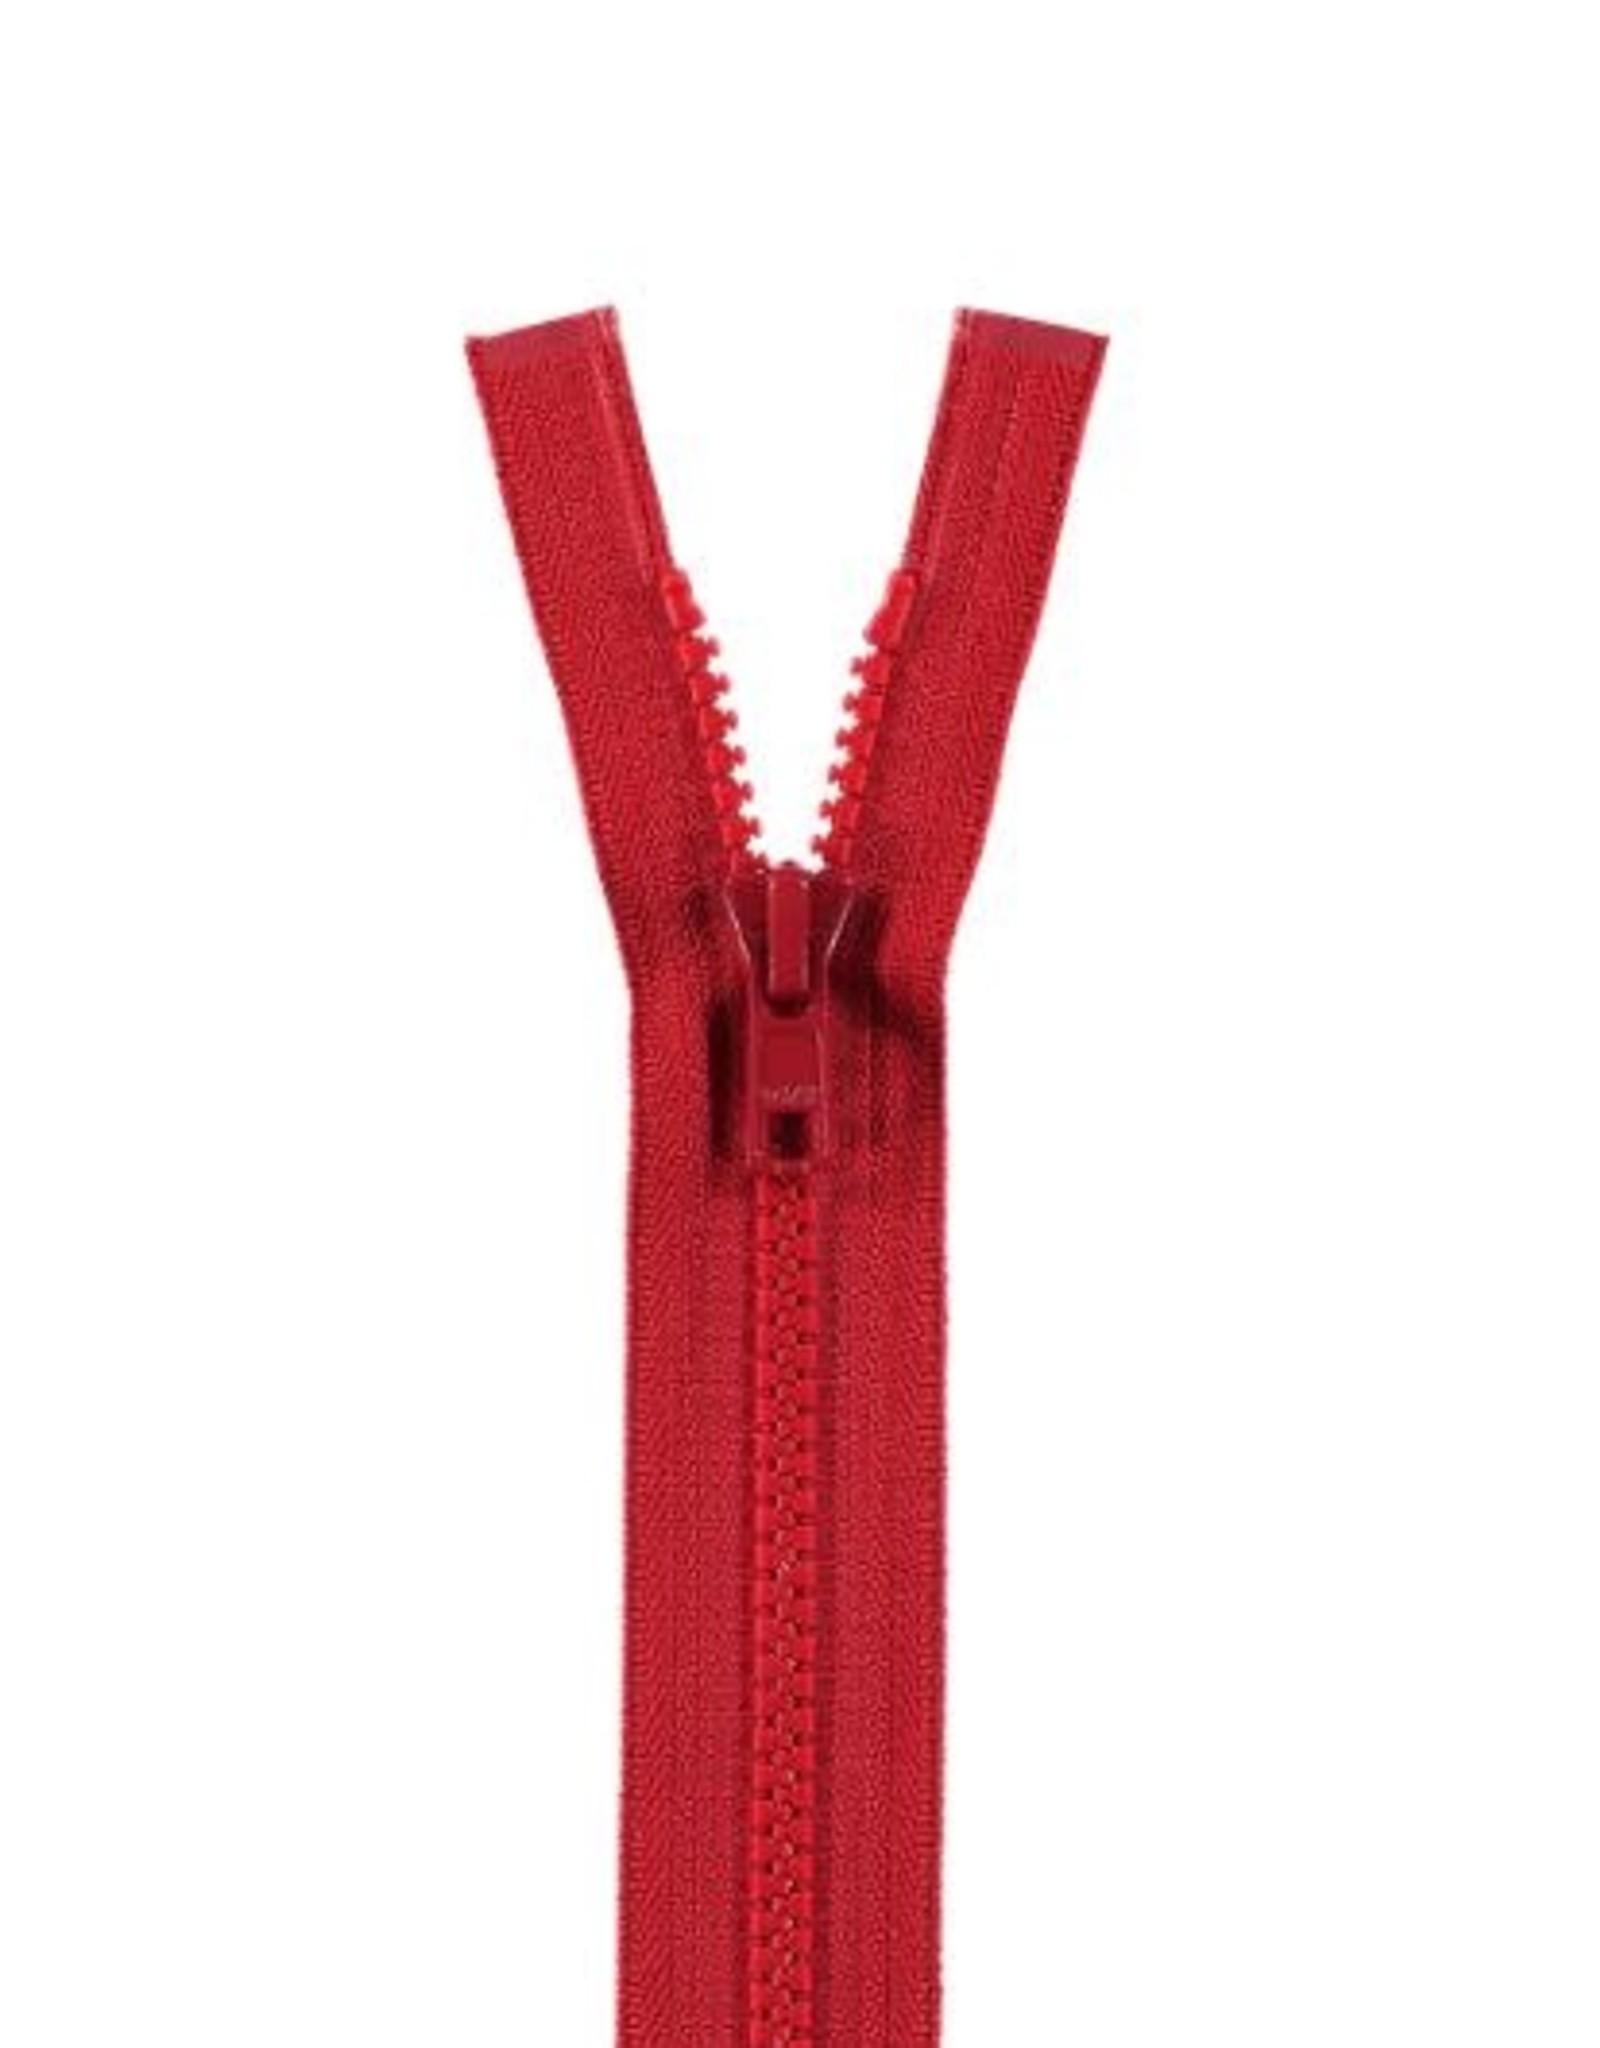 YKK BLOKRITS 5 DEELBAAR rood 519-75cm